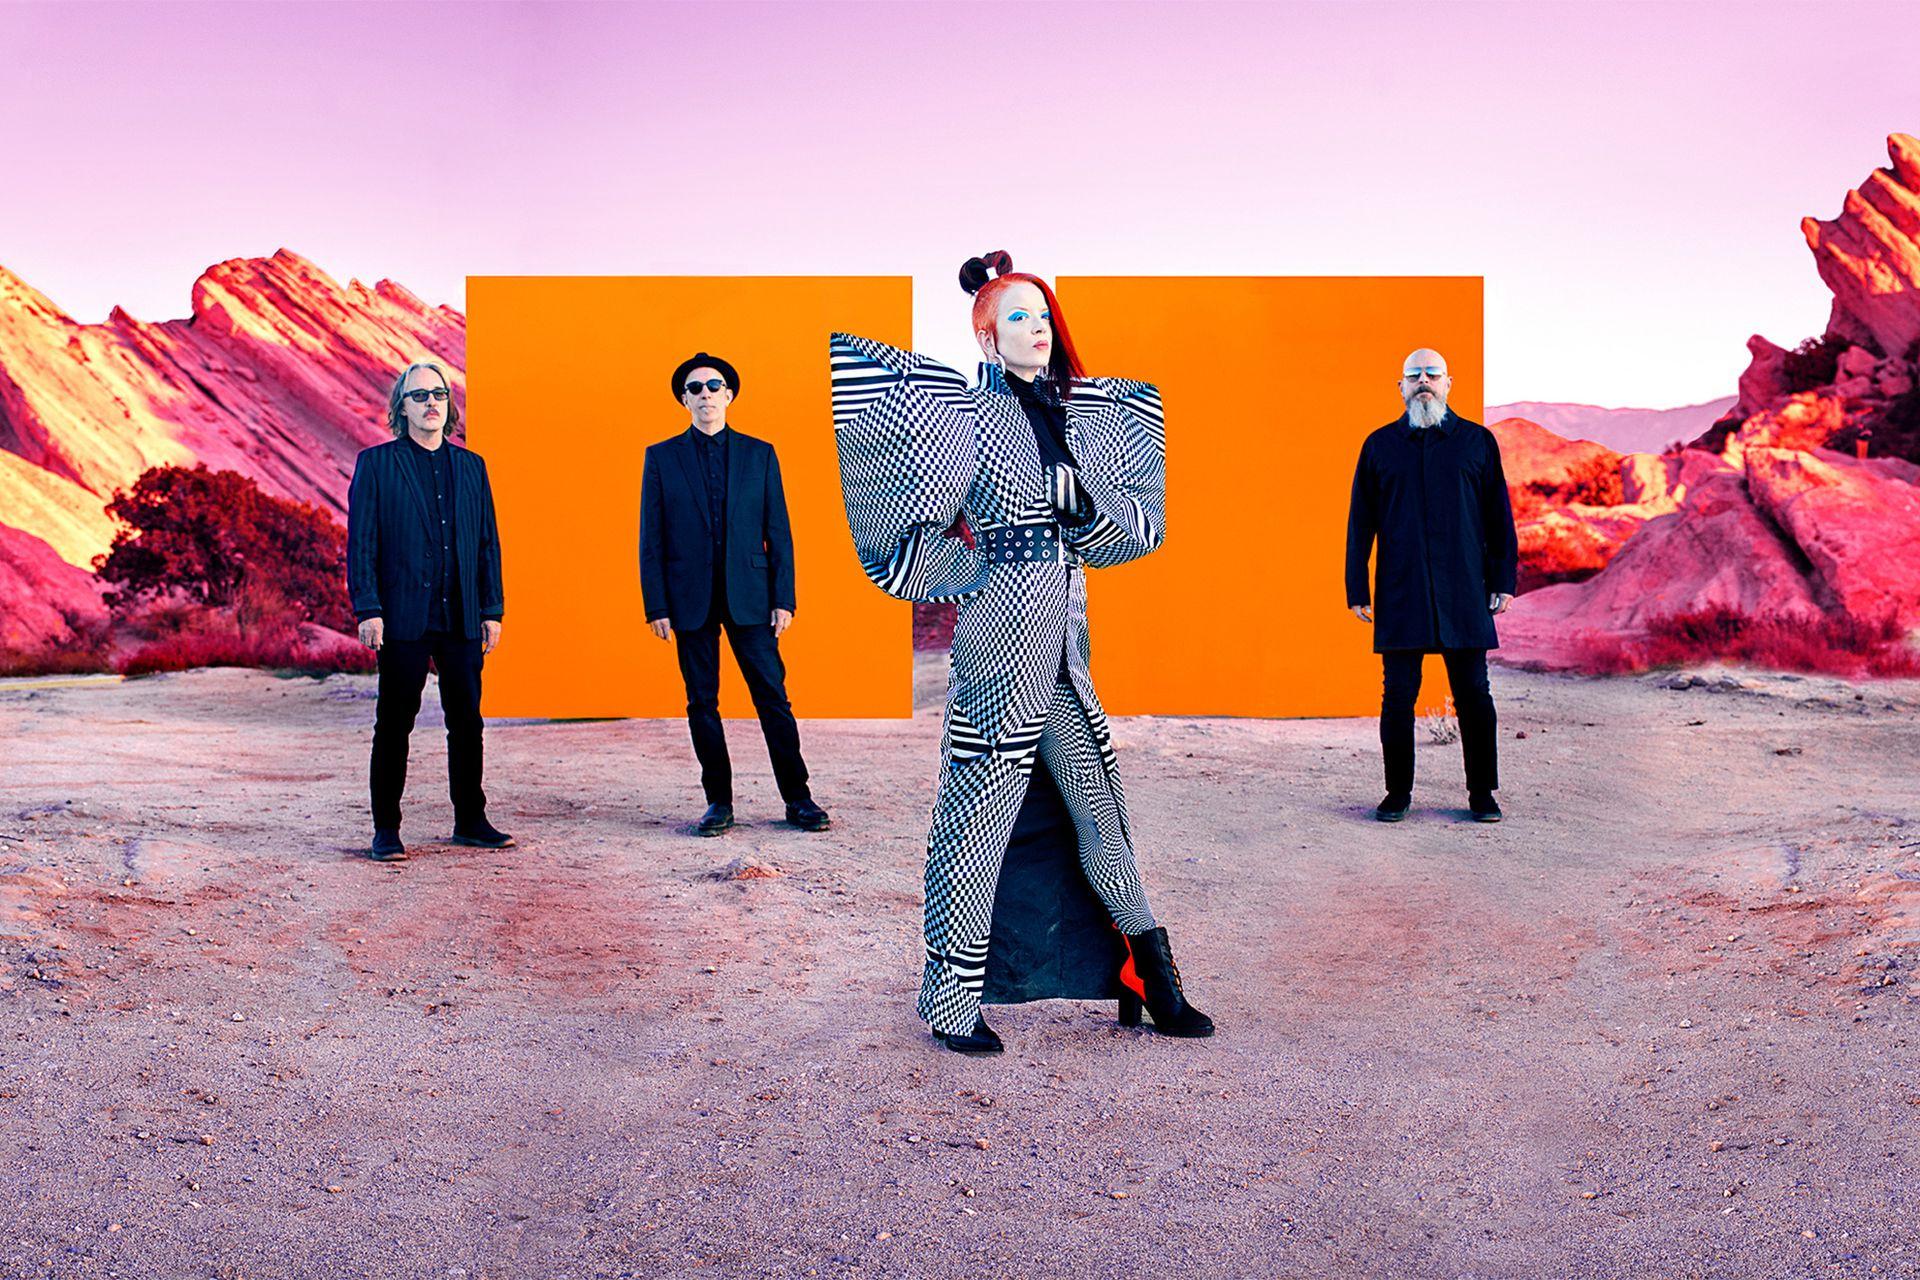 Garbage. banda de rock. Shirley Manson, cantante.